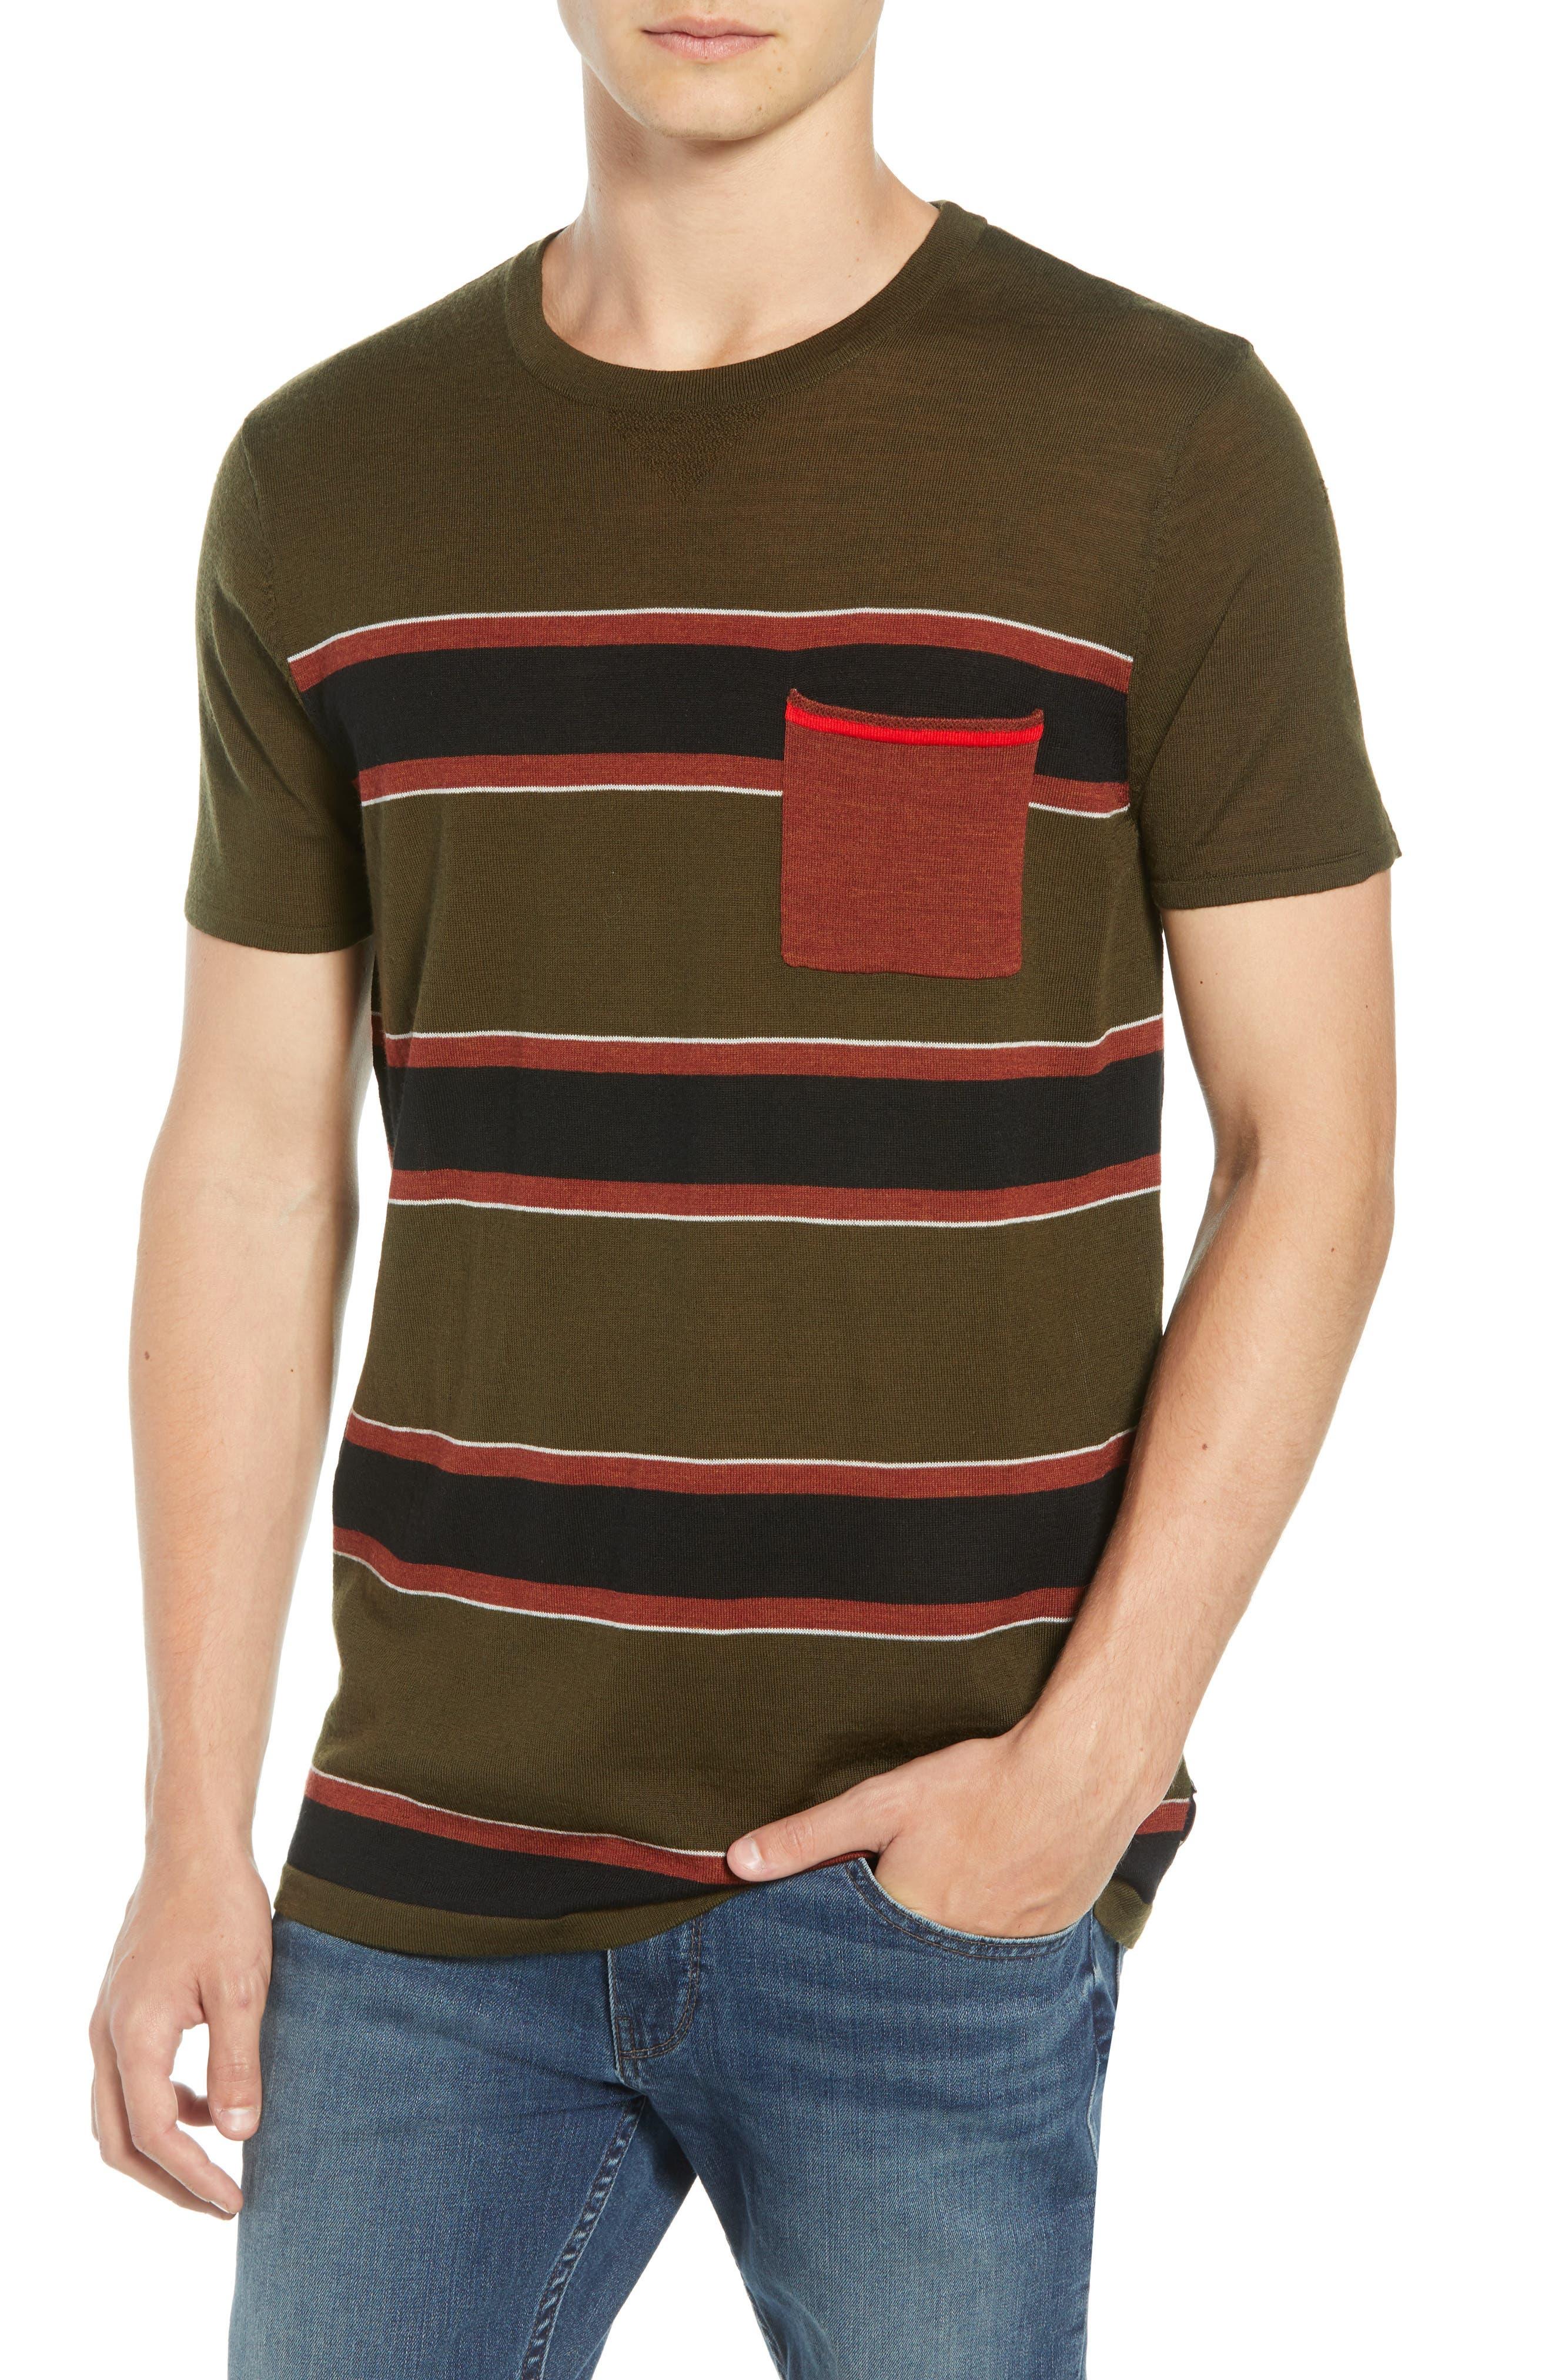 Scotch & Soda Stripe Merino Wool Pocket T-Shirt, Brown